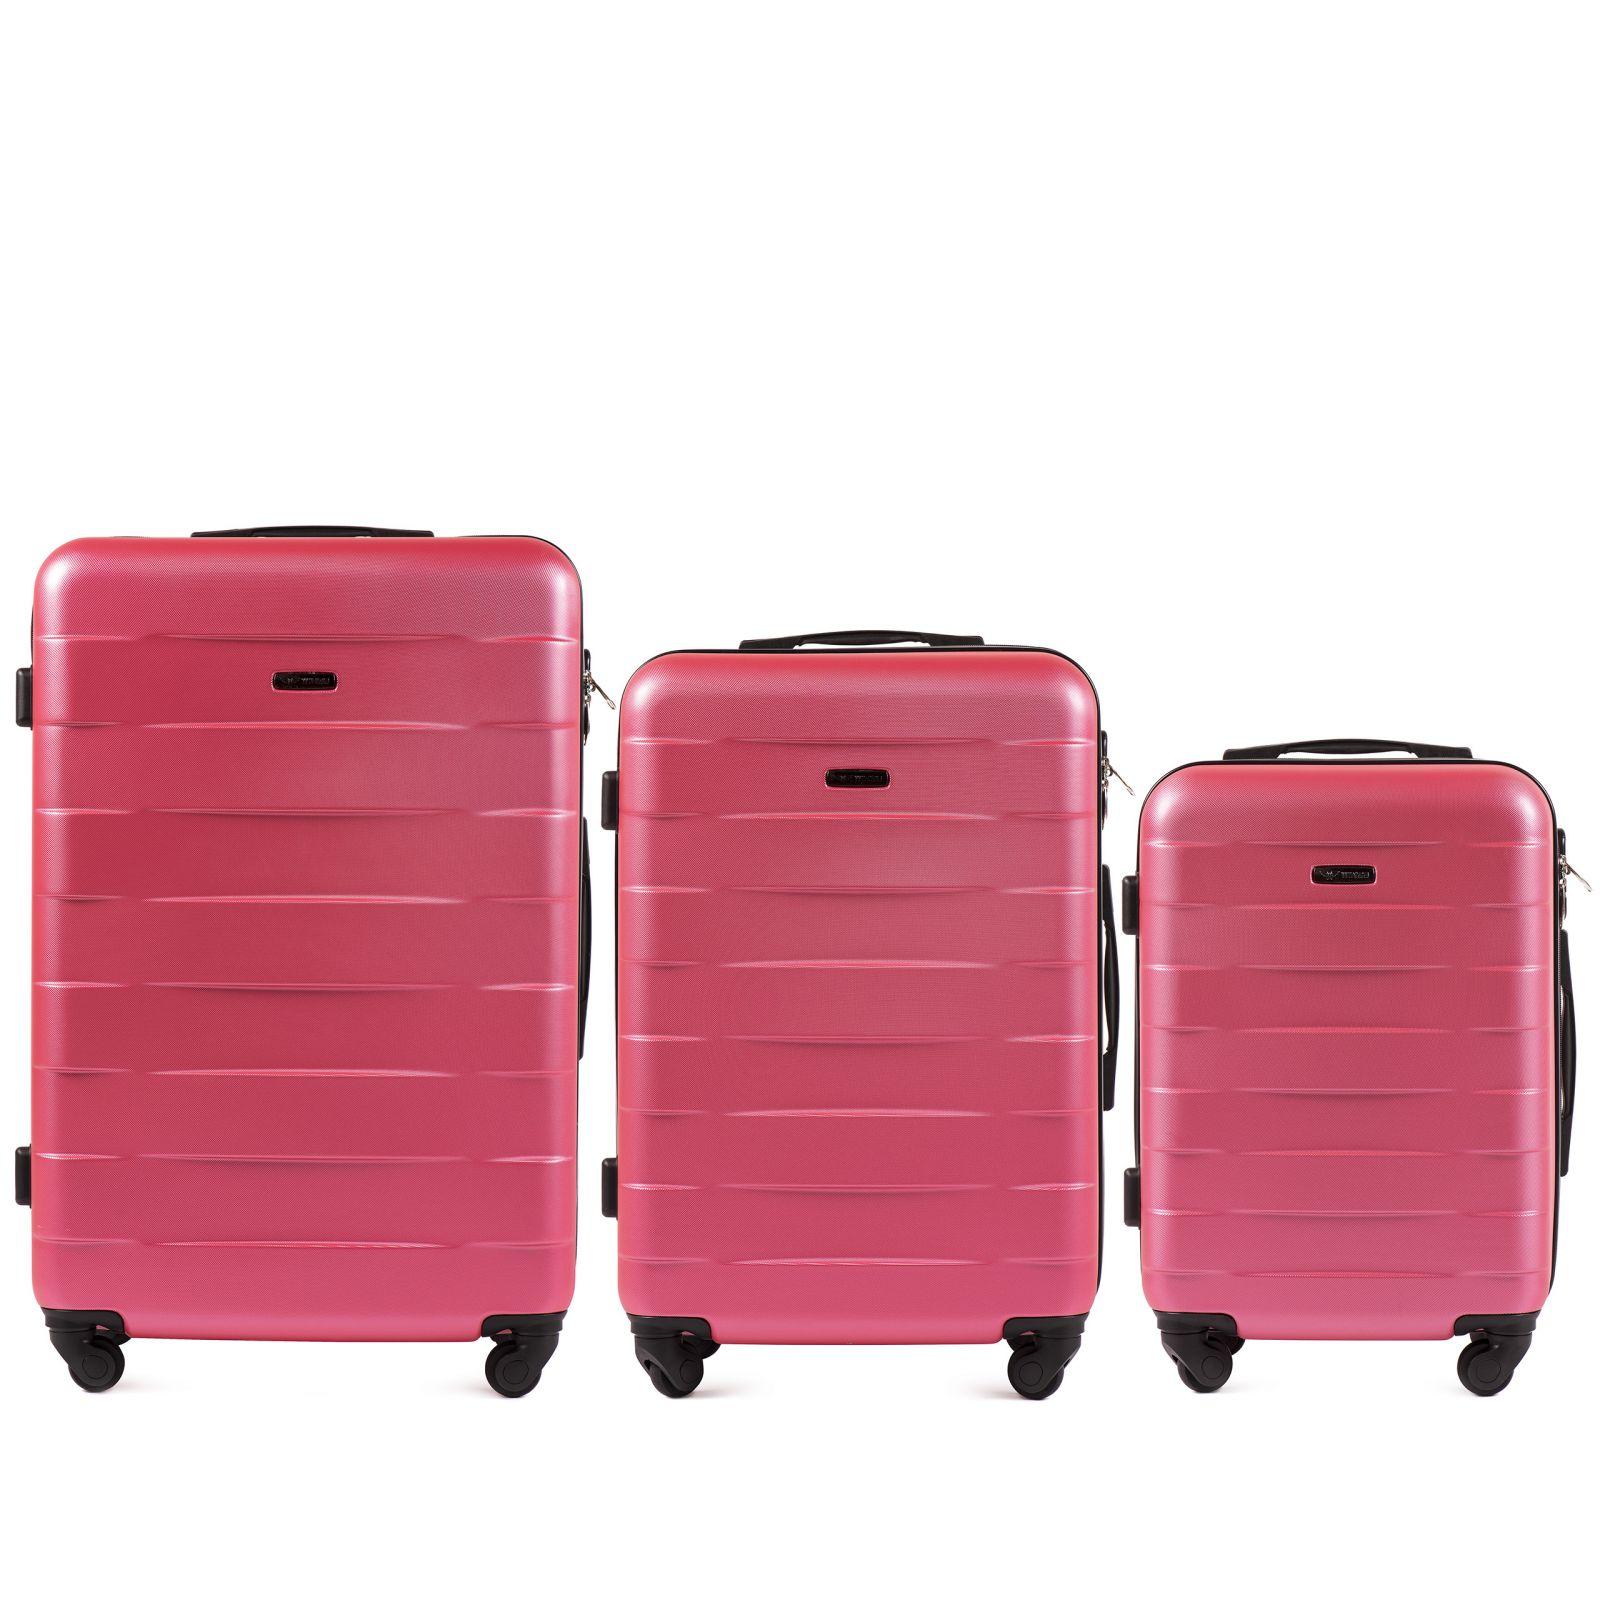 Cestovní kufry sada WINGS CAMARO ABS ROSE RED L,M,S